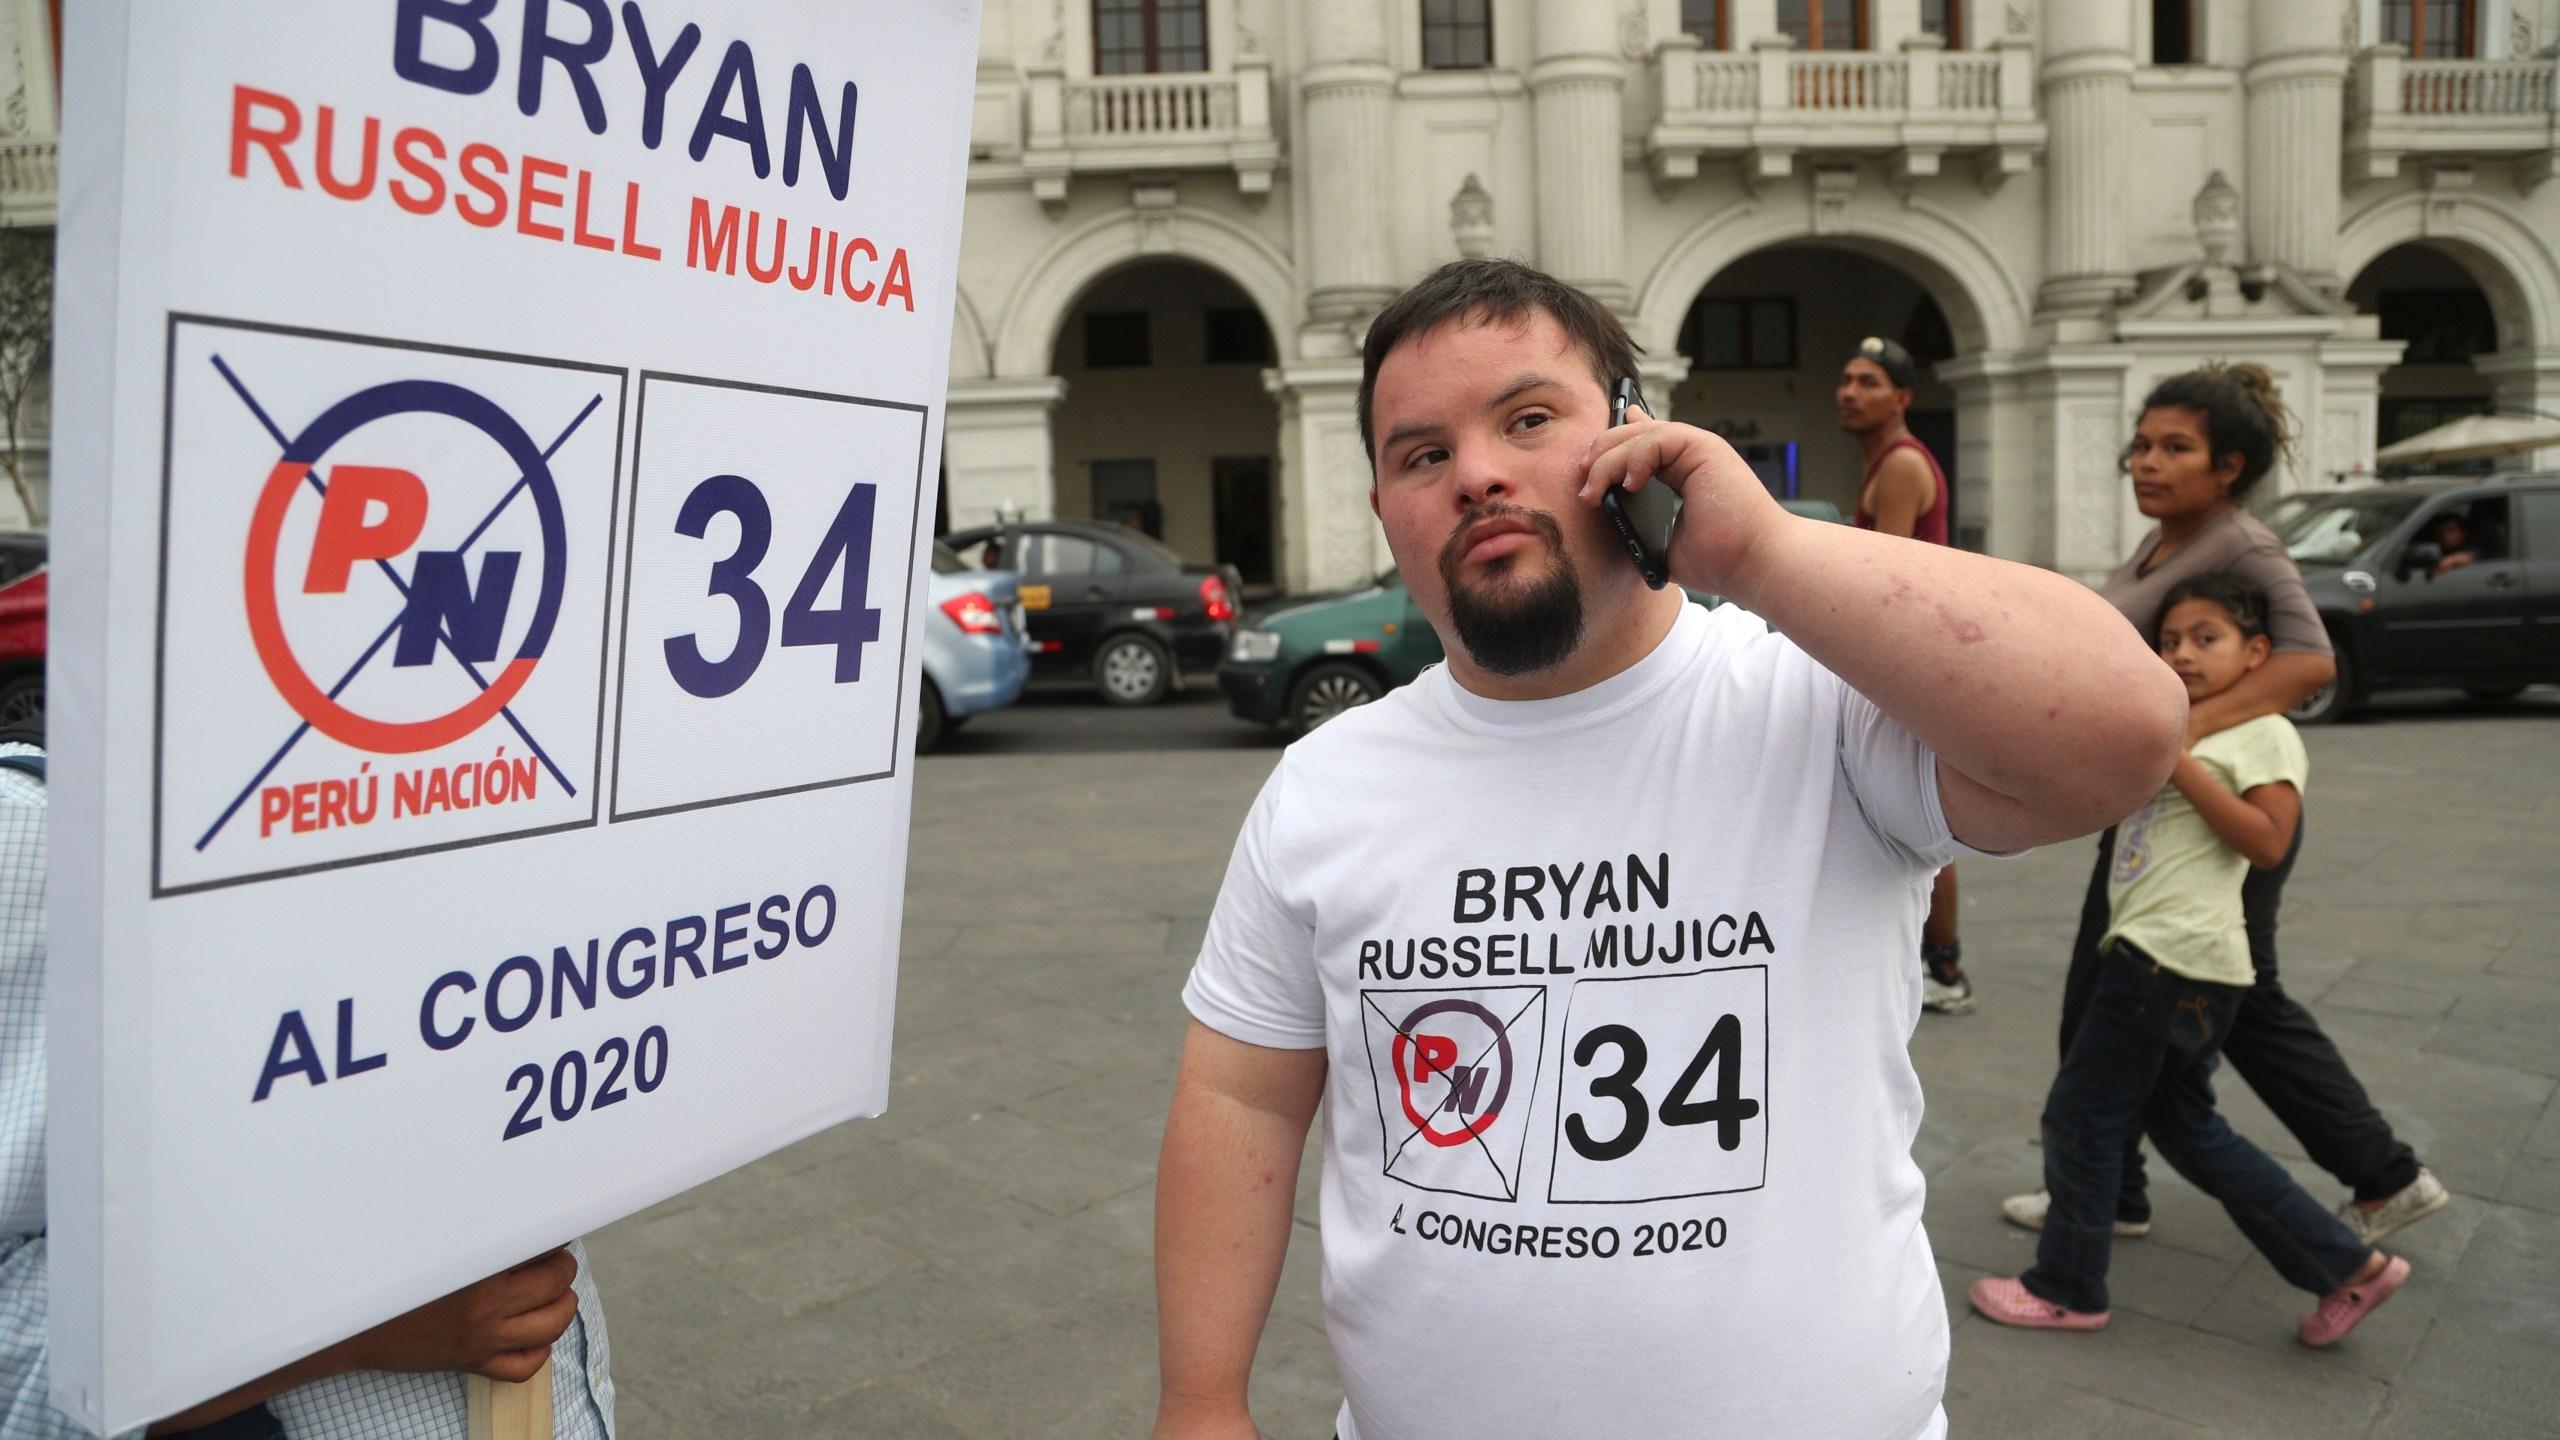 Bryan Russell